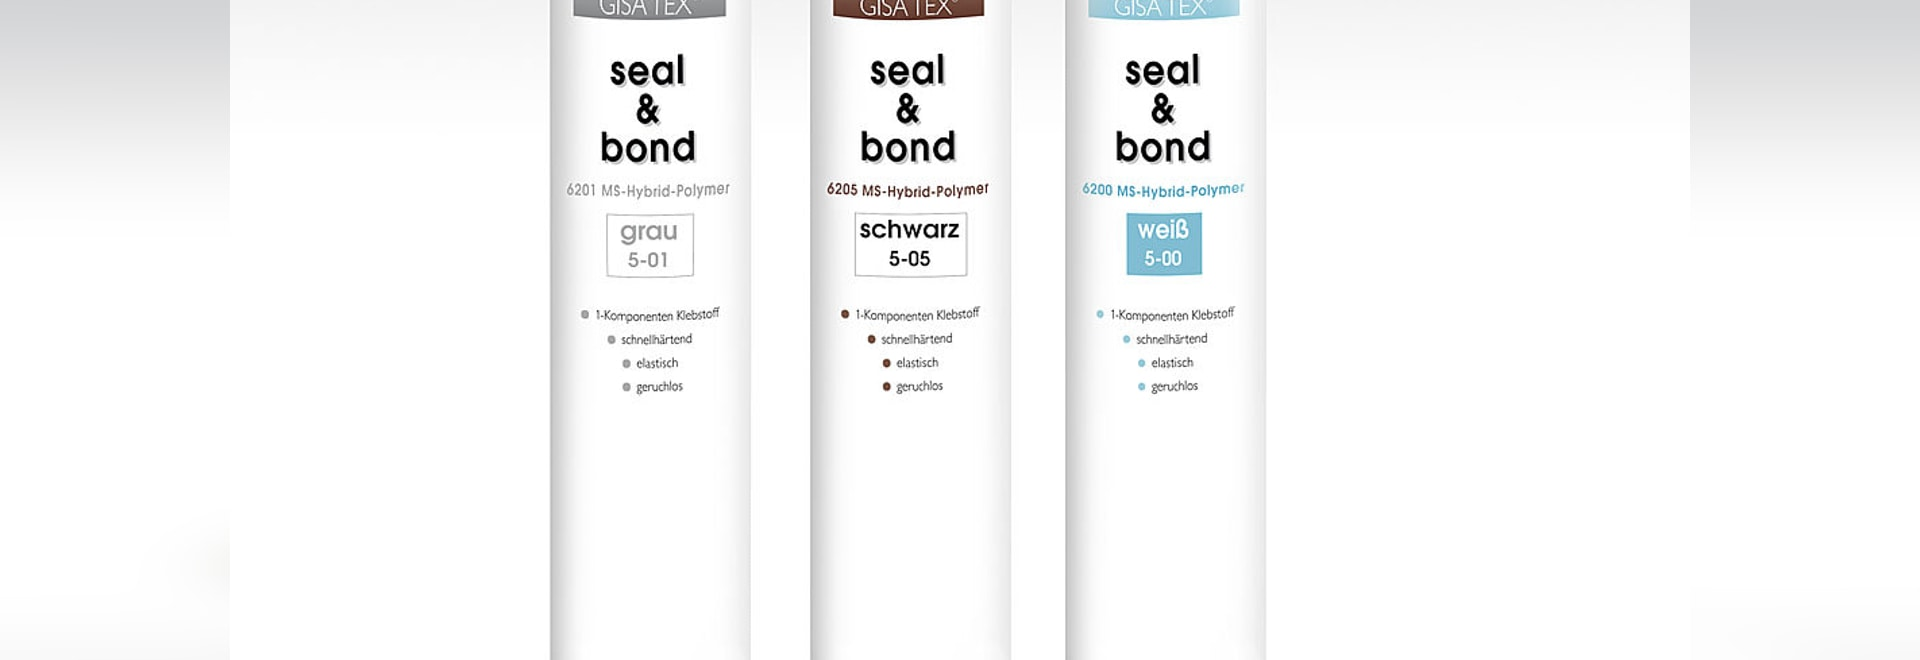 seal & bond Premium glue by GISATEX